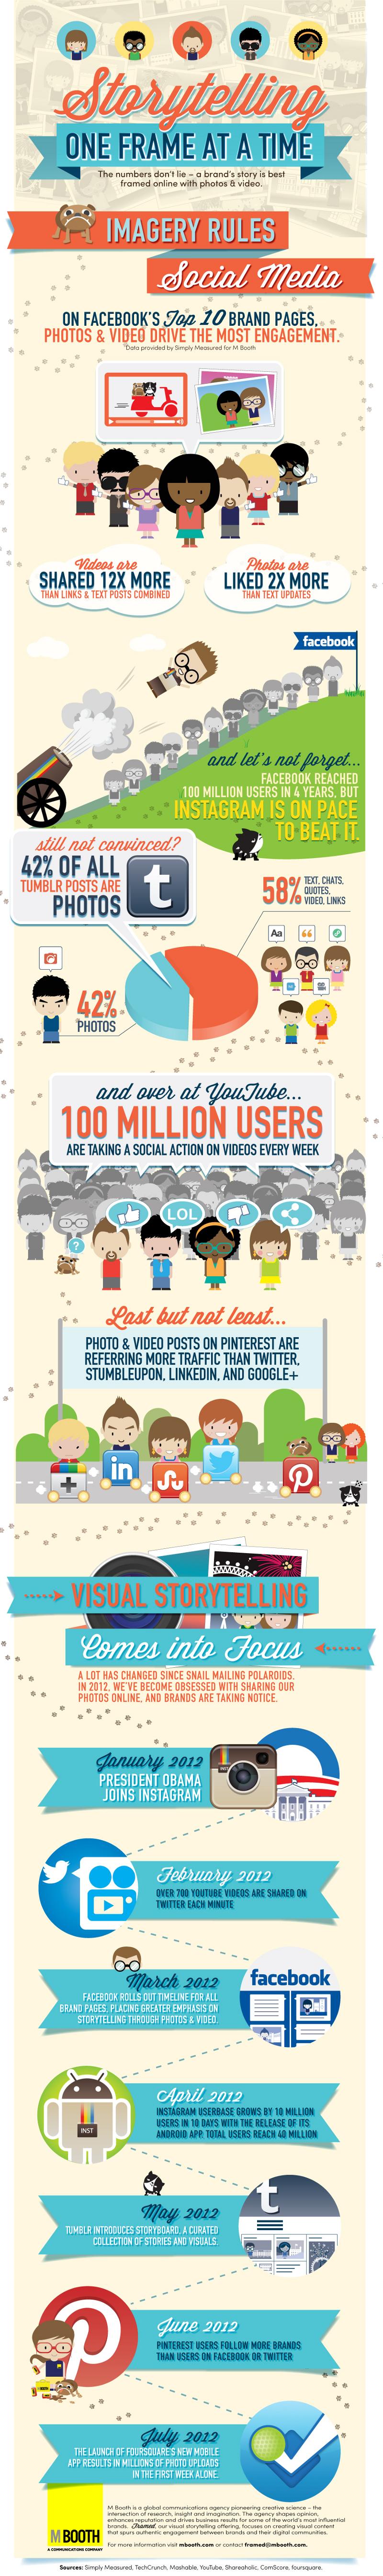 Visual Storytelling for Social Media